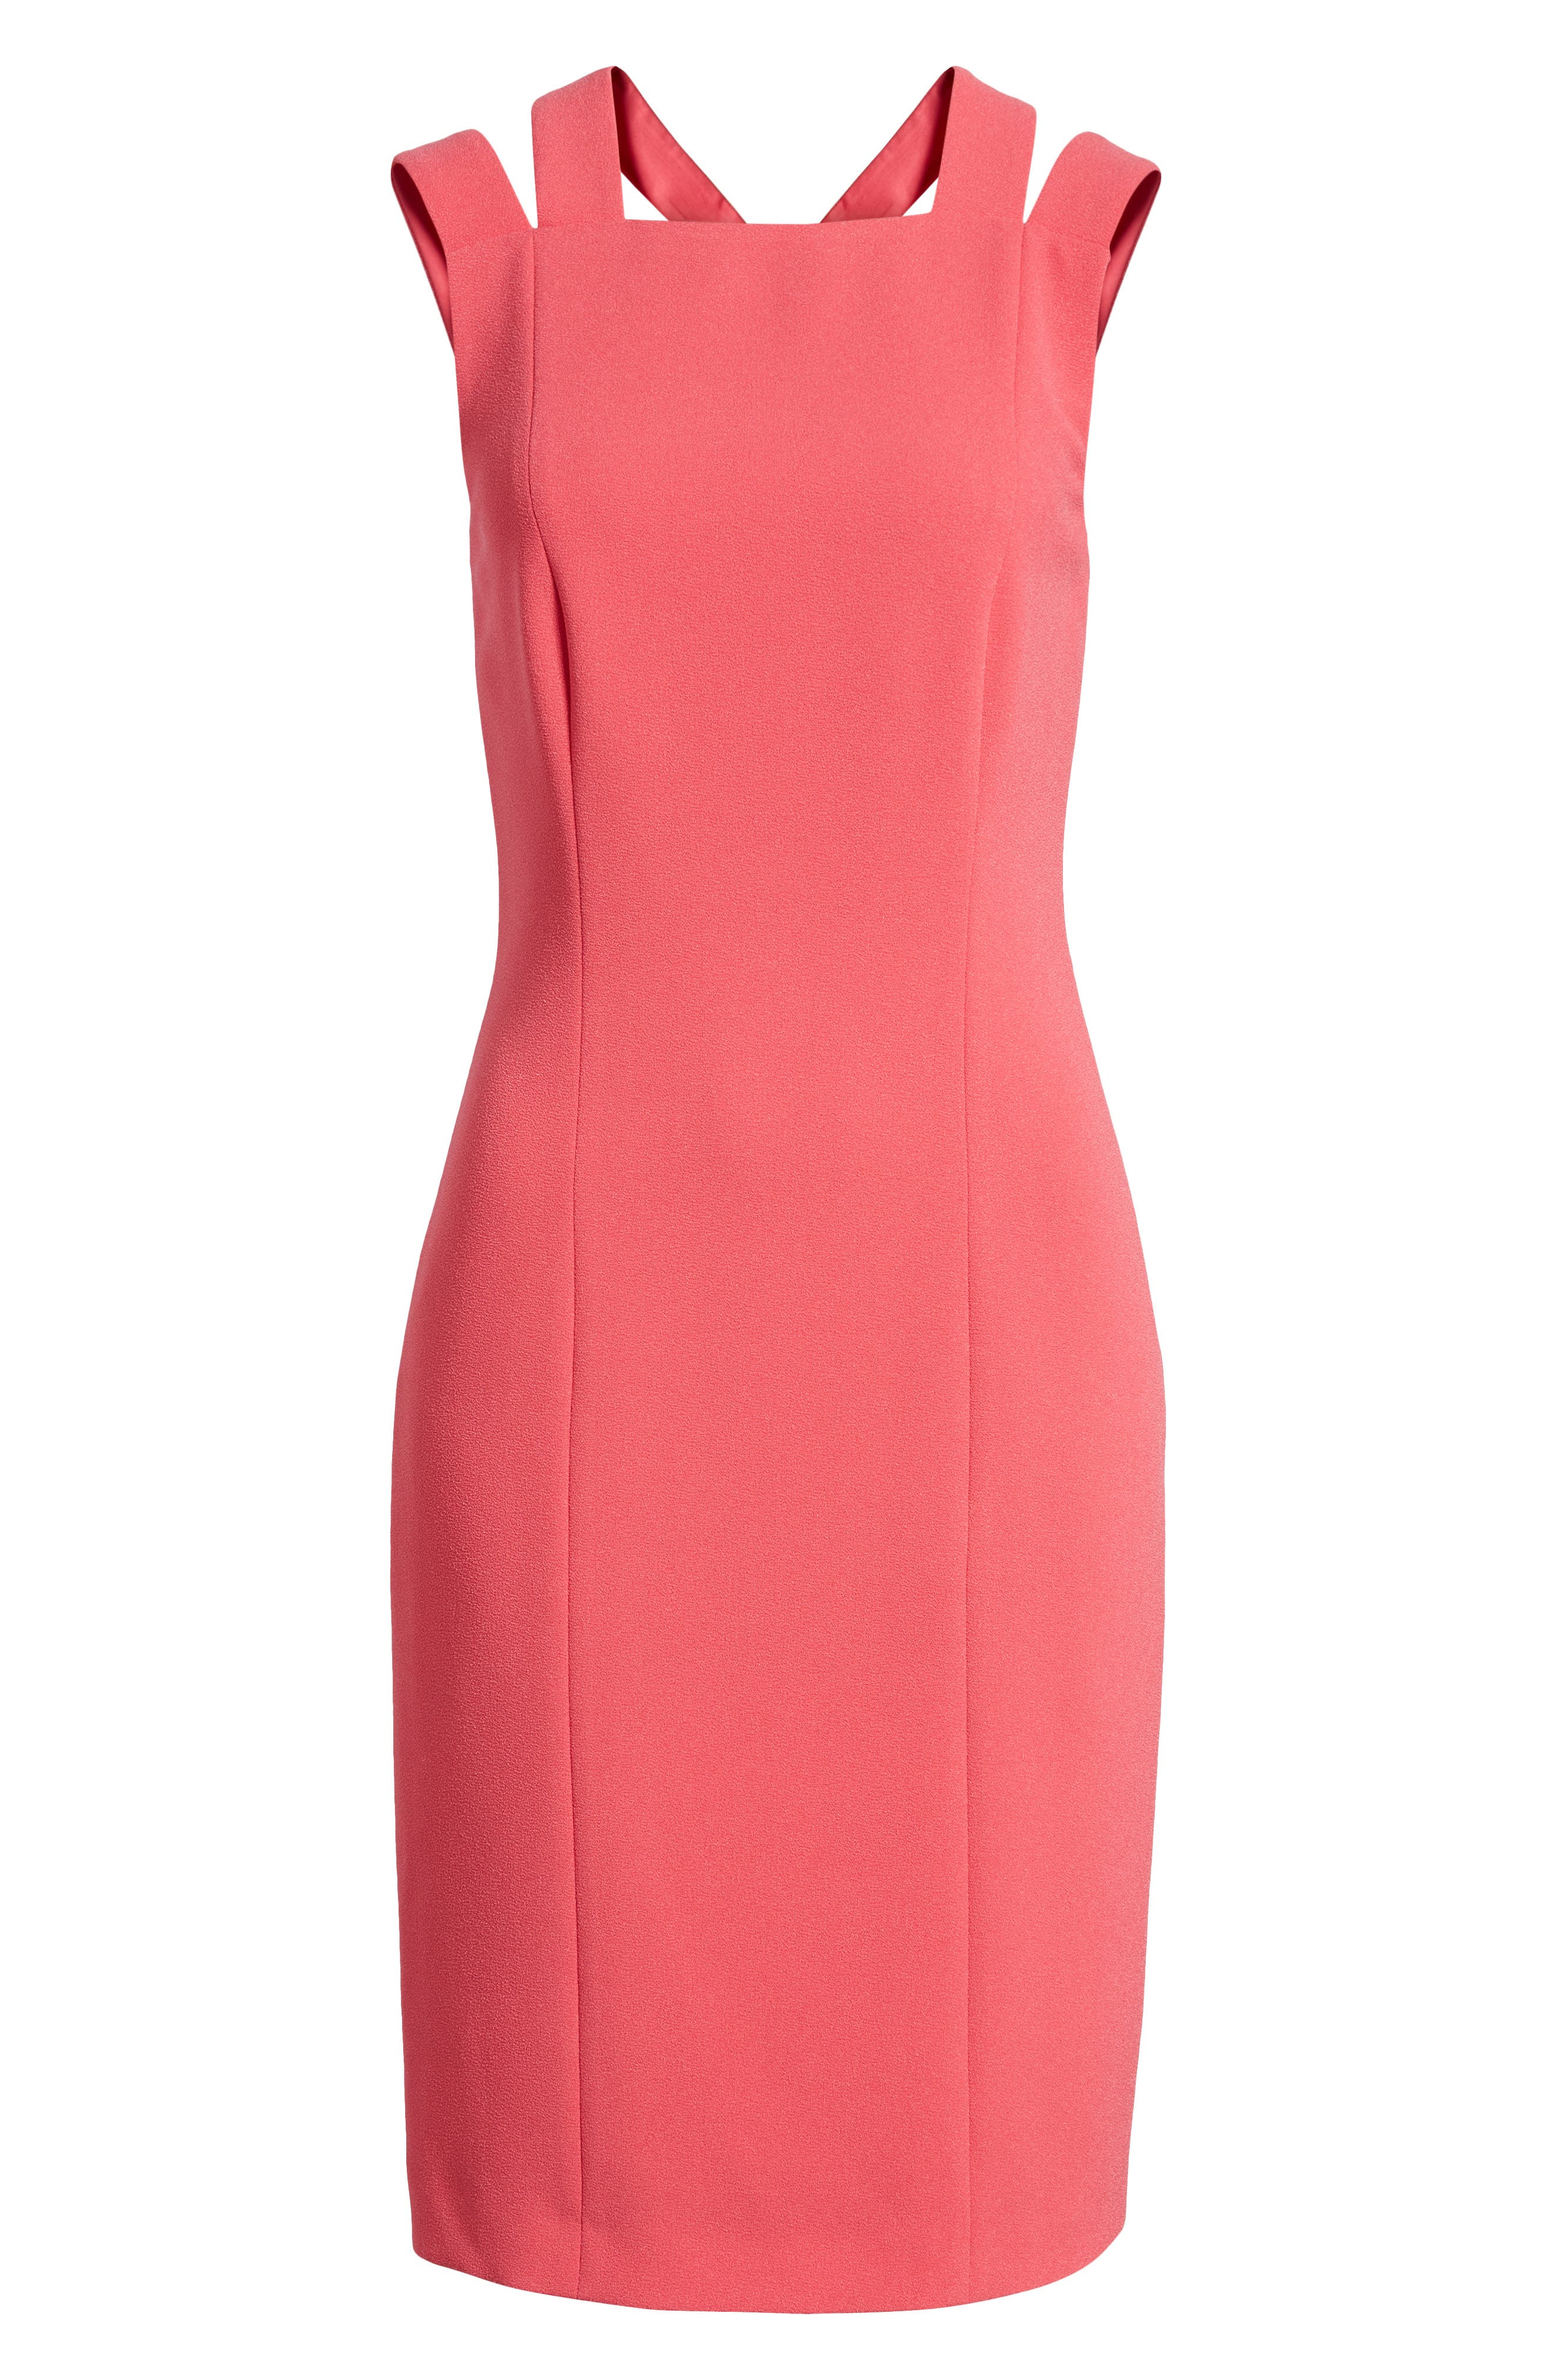 Daphima Compact Crepe Sheath Dress,                             Alternate thumbnail 7, color,                             692